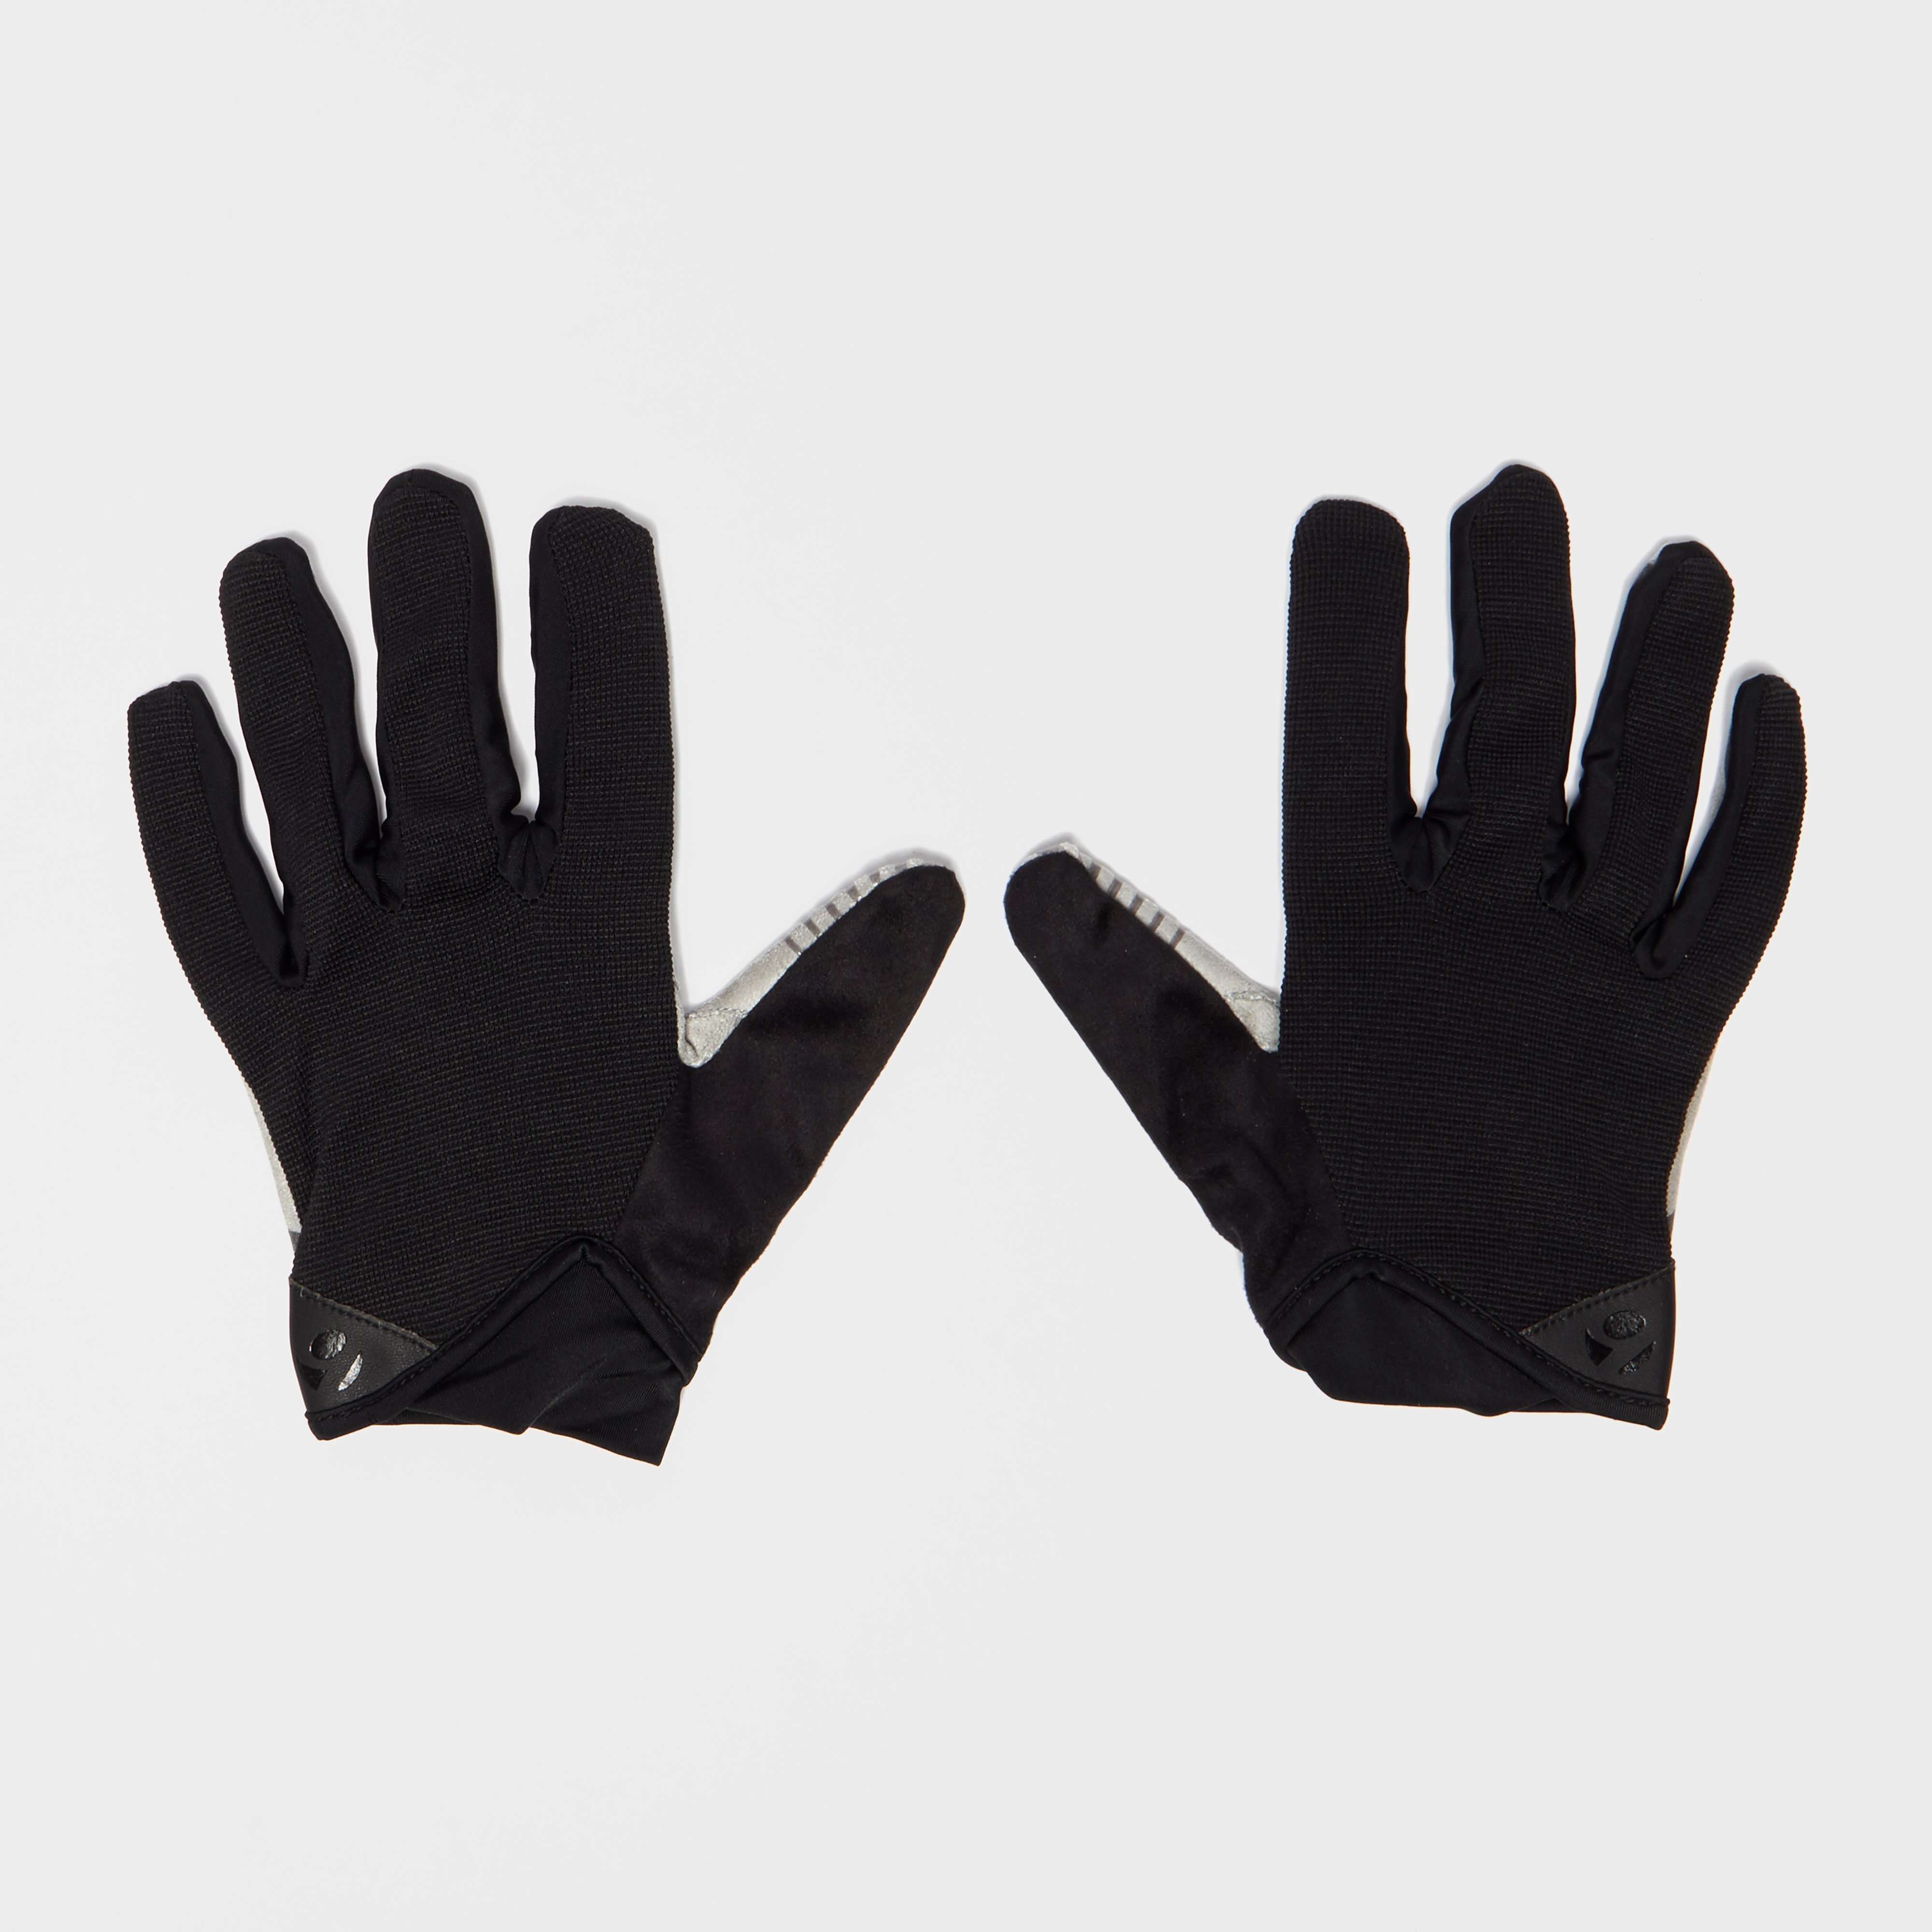 BONTRAGER Rhythm MTB Gloves